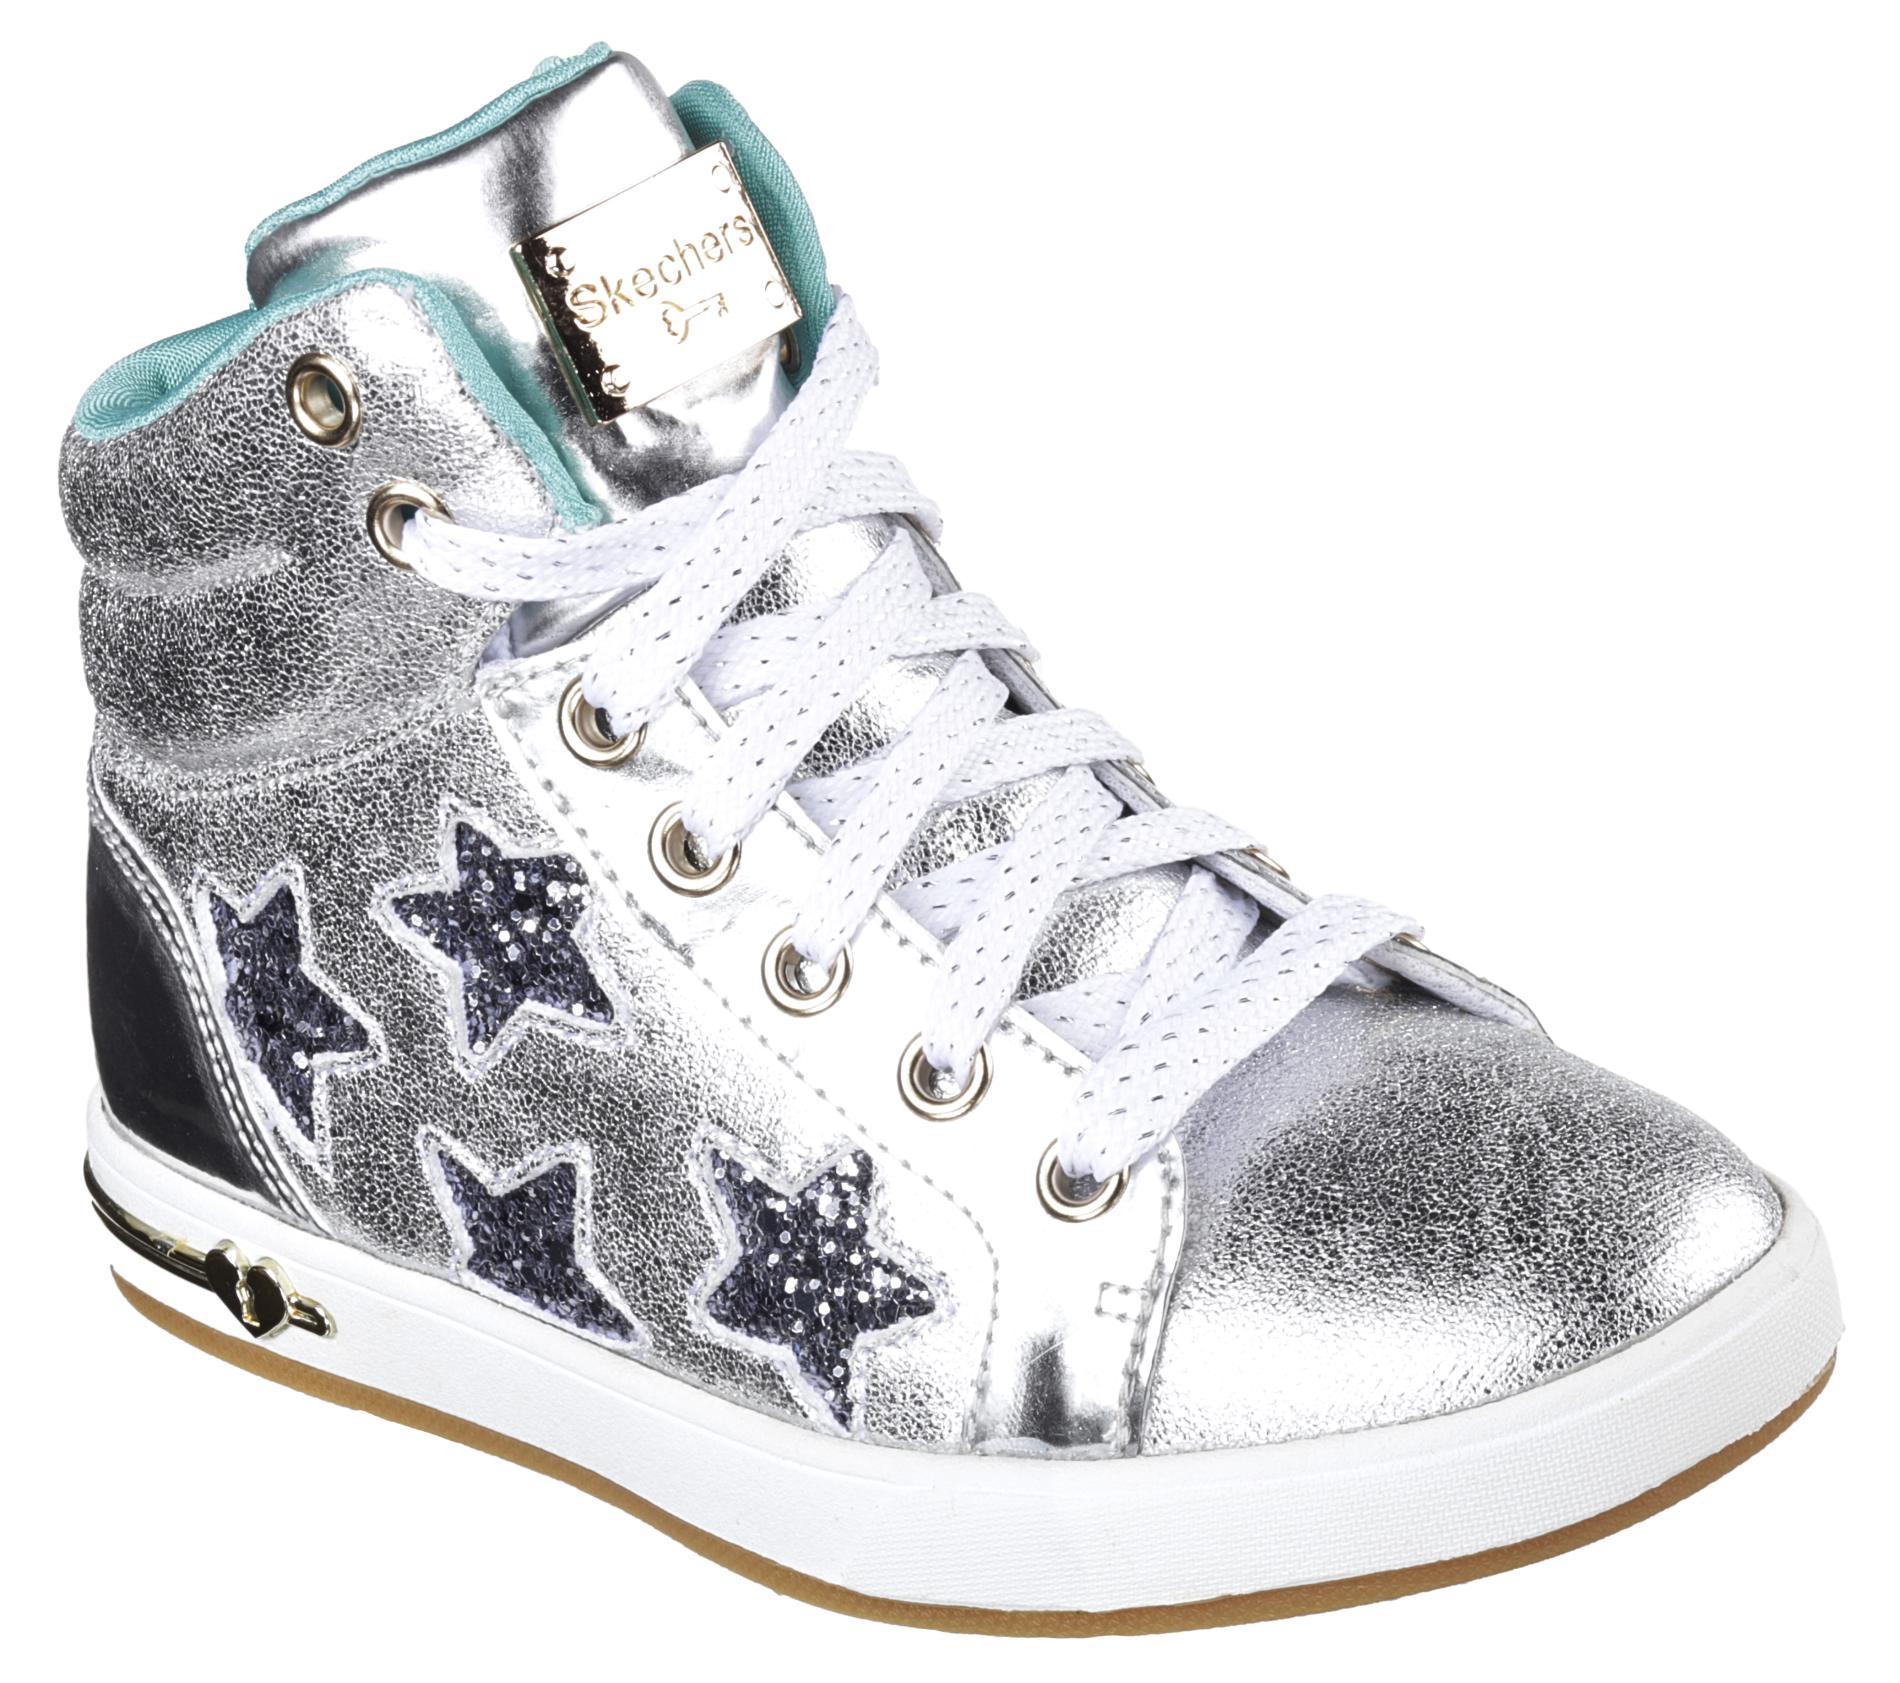 Skechers Shoes Baby Girls